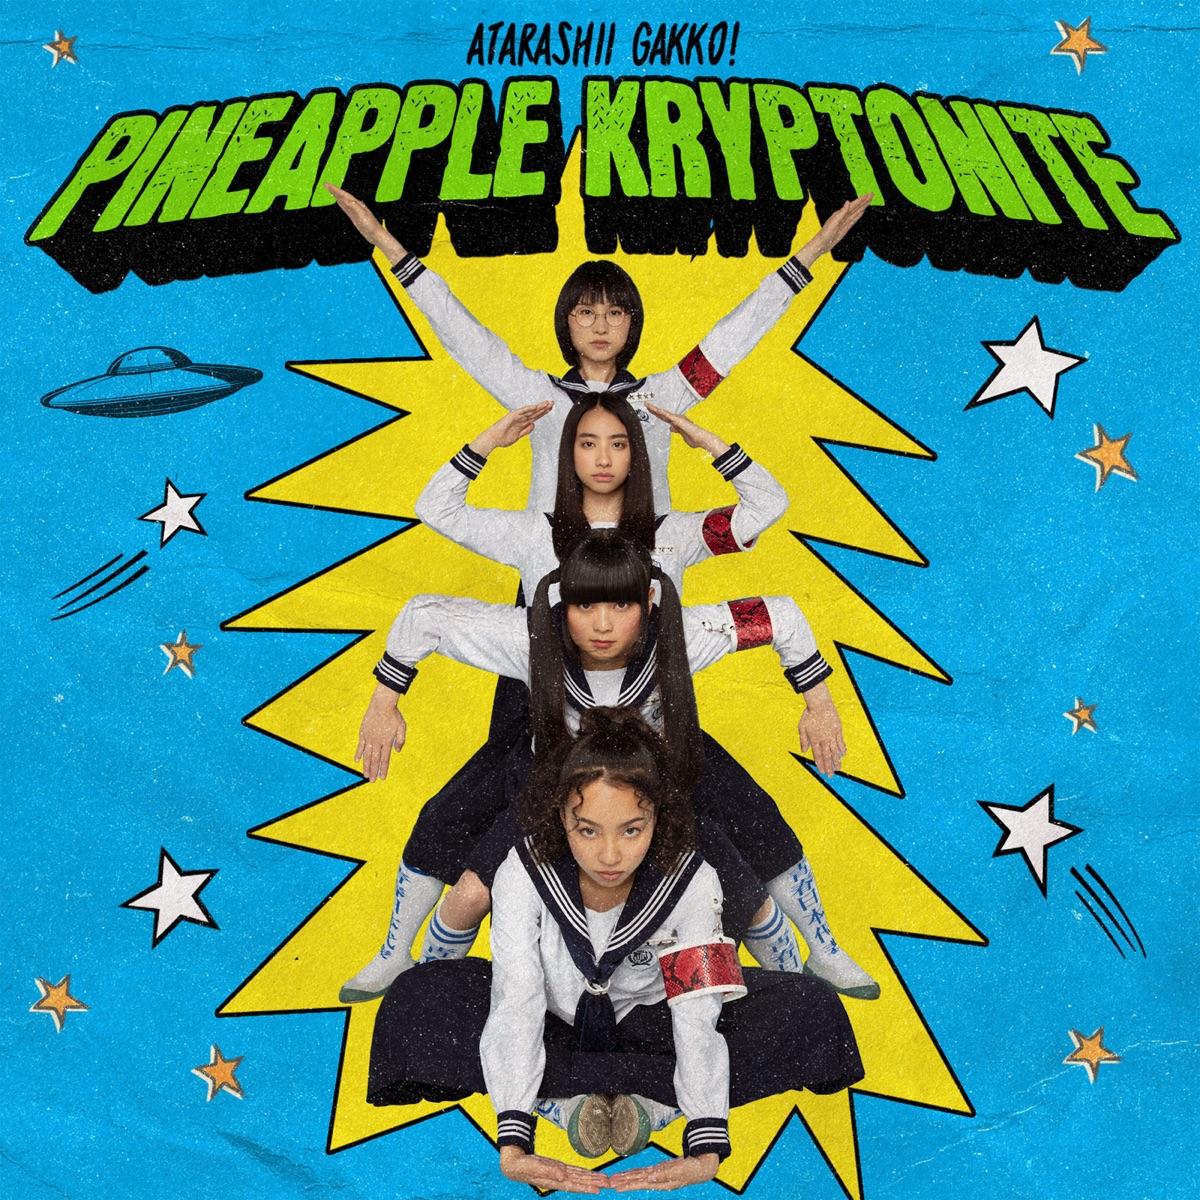 Cover image of『ATARASHII GAKKO!Pineapple Kryptonite』from the Album『』